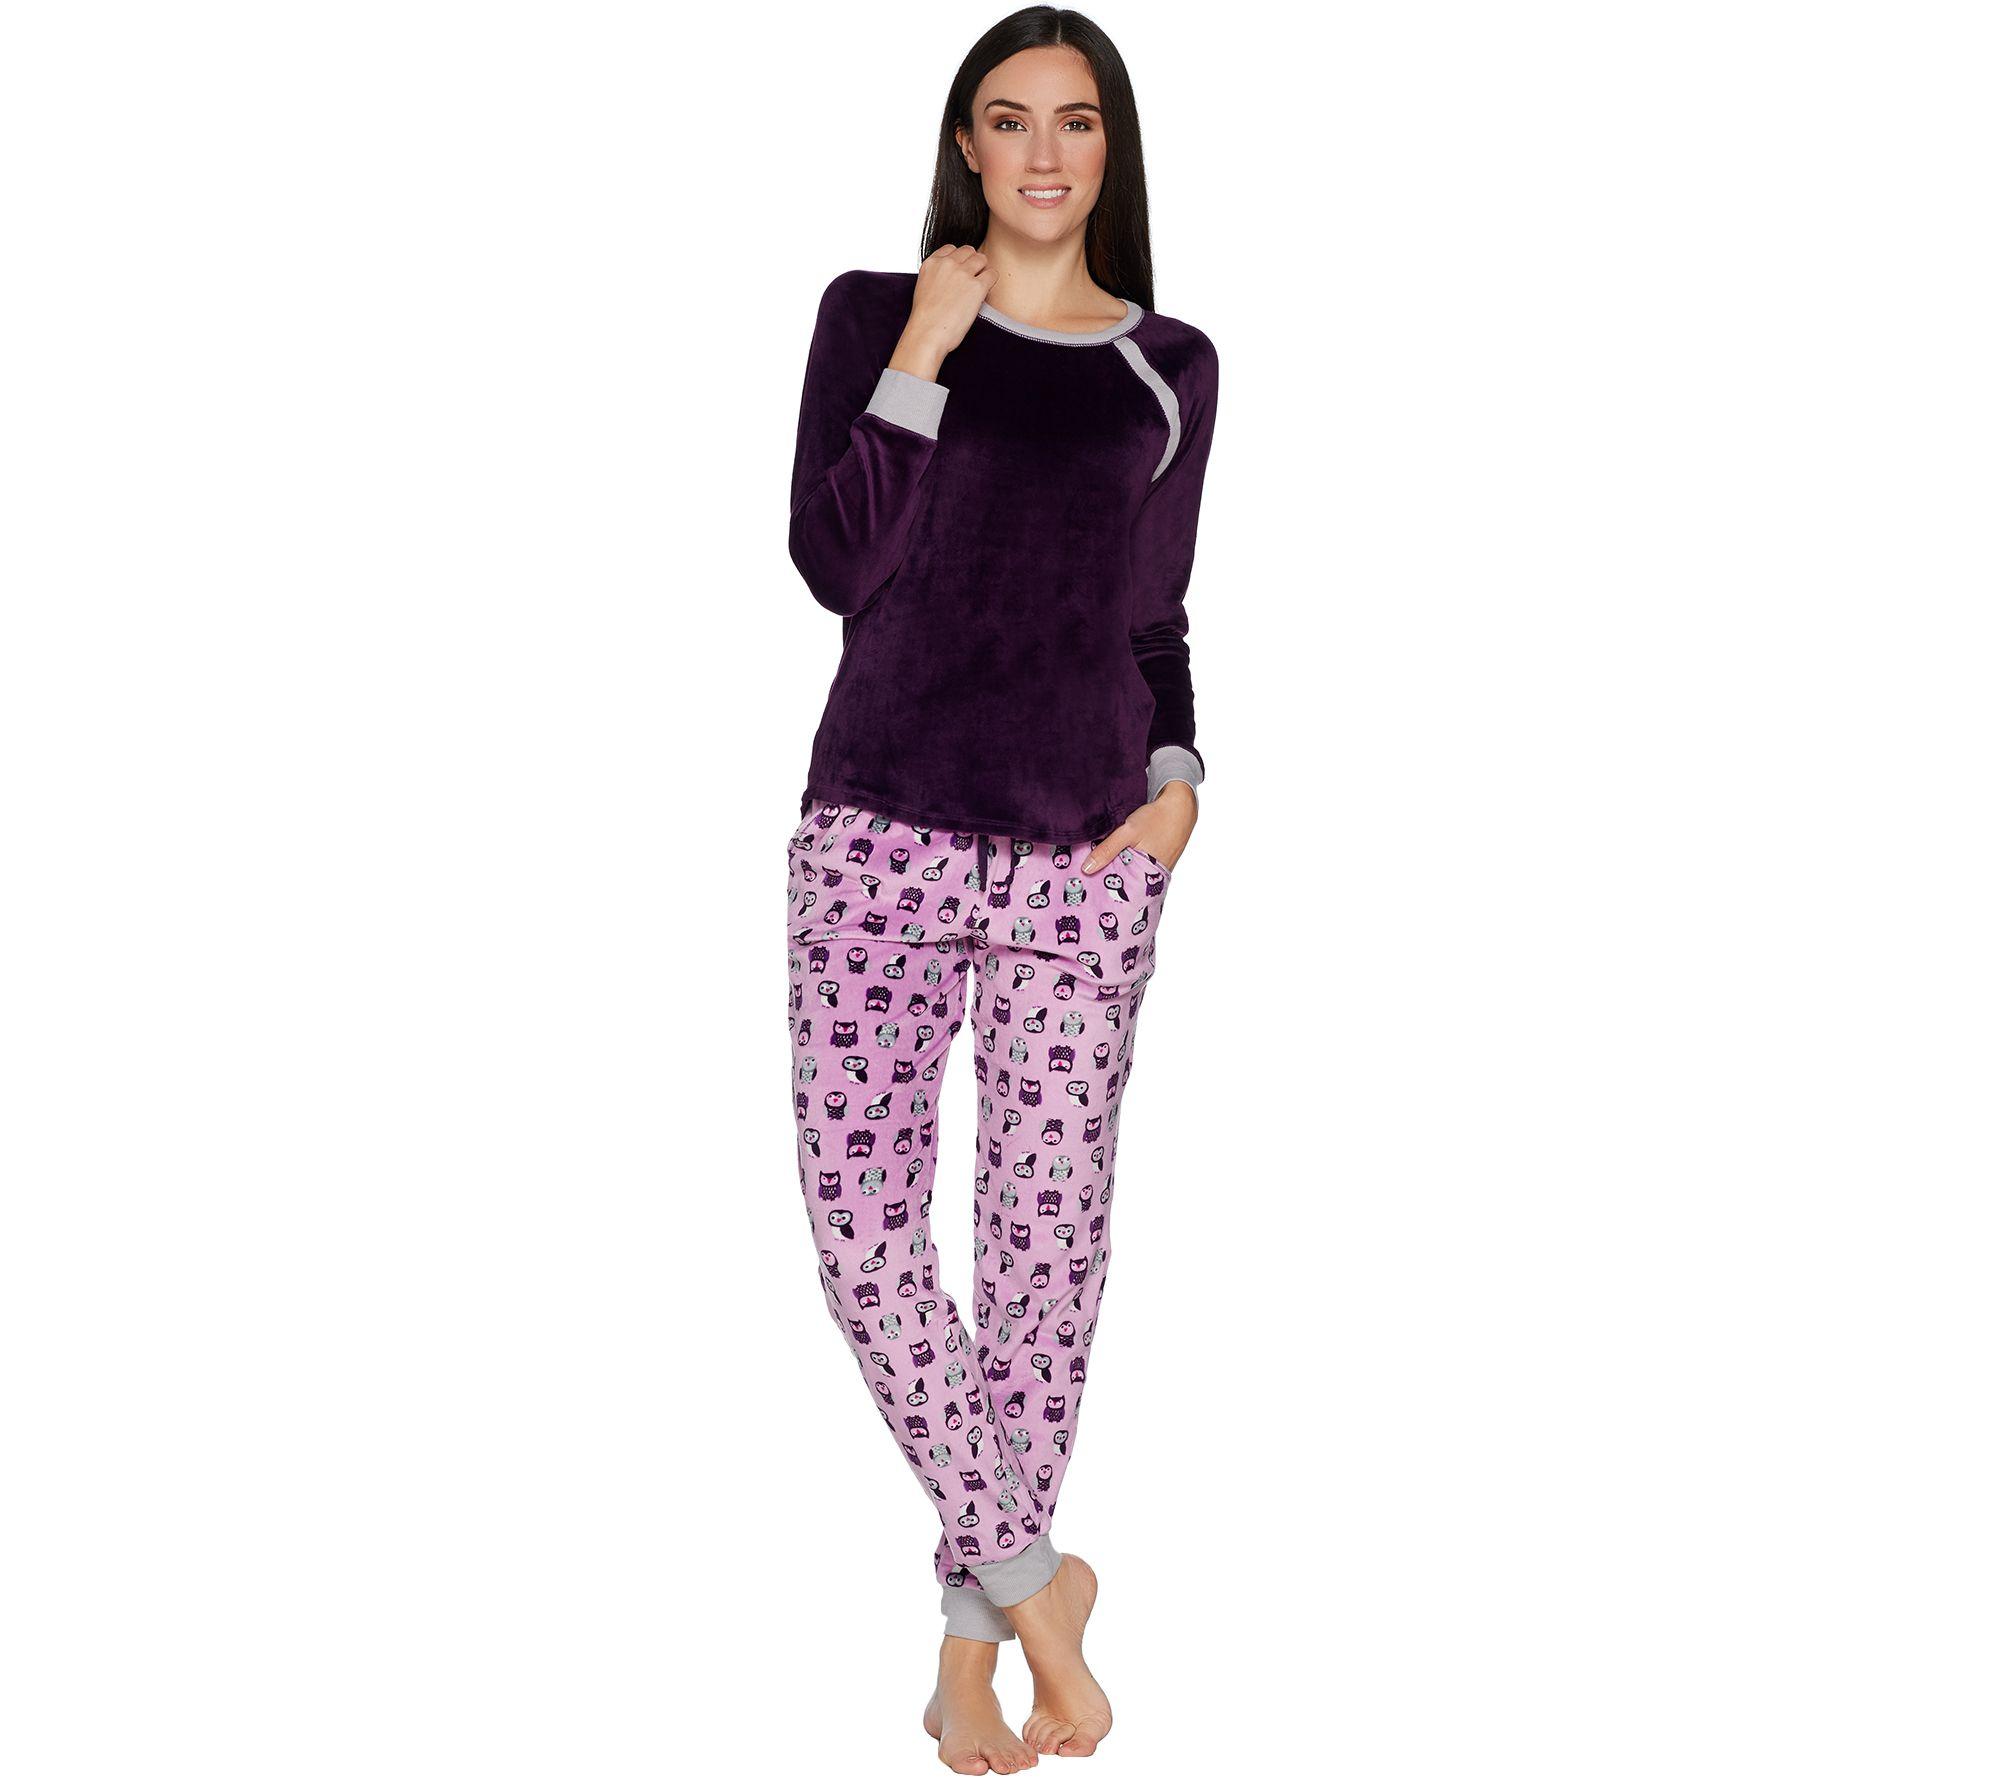 983037665c Cuddl Duds Ultra Plush Velvet Fleece Novelty Pajama Set - Page 1 ...